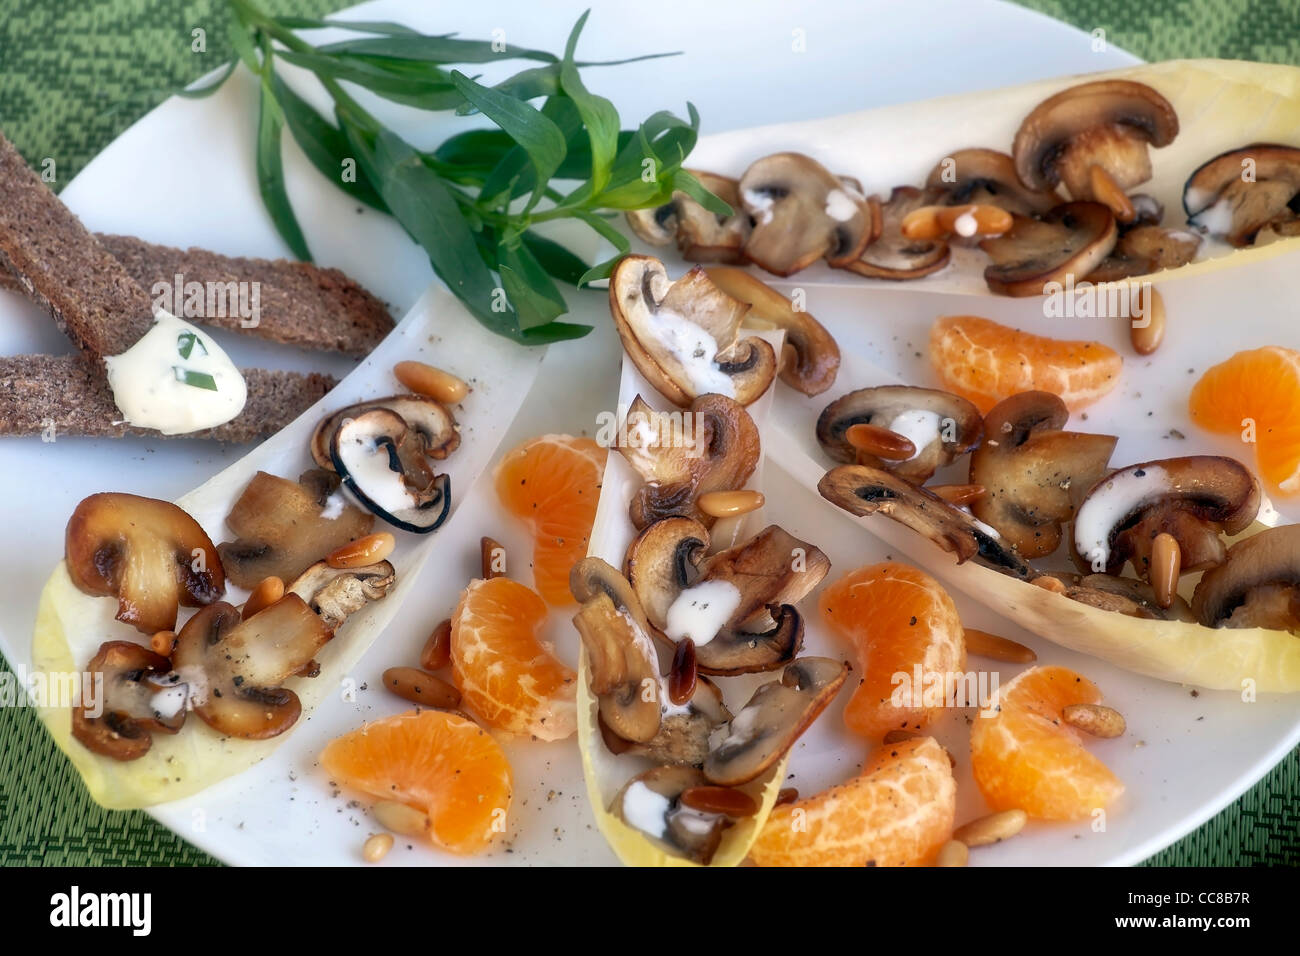 Chicory salad with mandarin oranges, mushrooms and pine nuts  - Stock Image